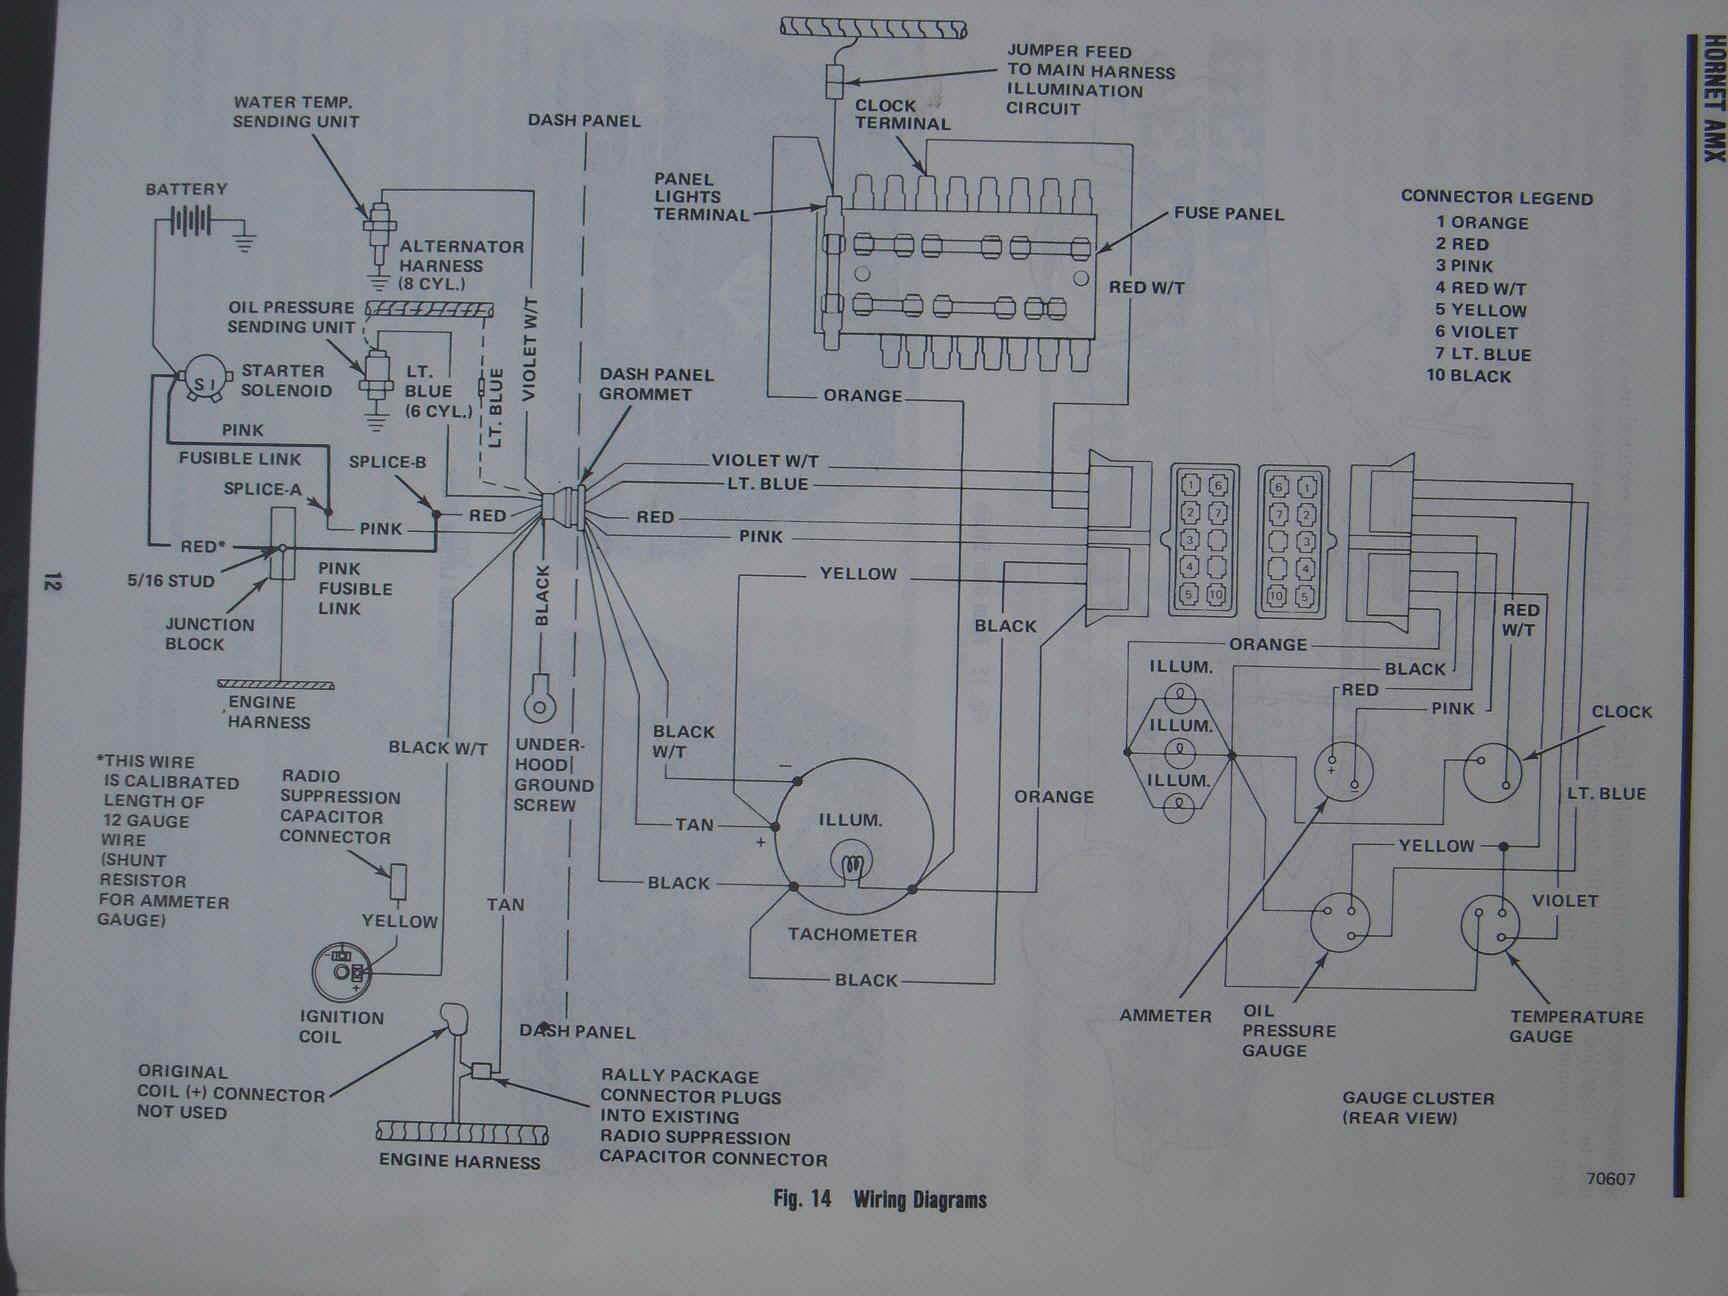 75 Amc Wiring Diagrams | Wiring Diagram Jeep Amc Alternator Wiring Diagram on